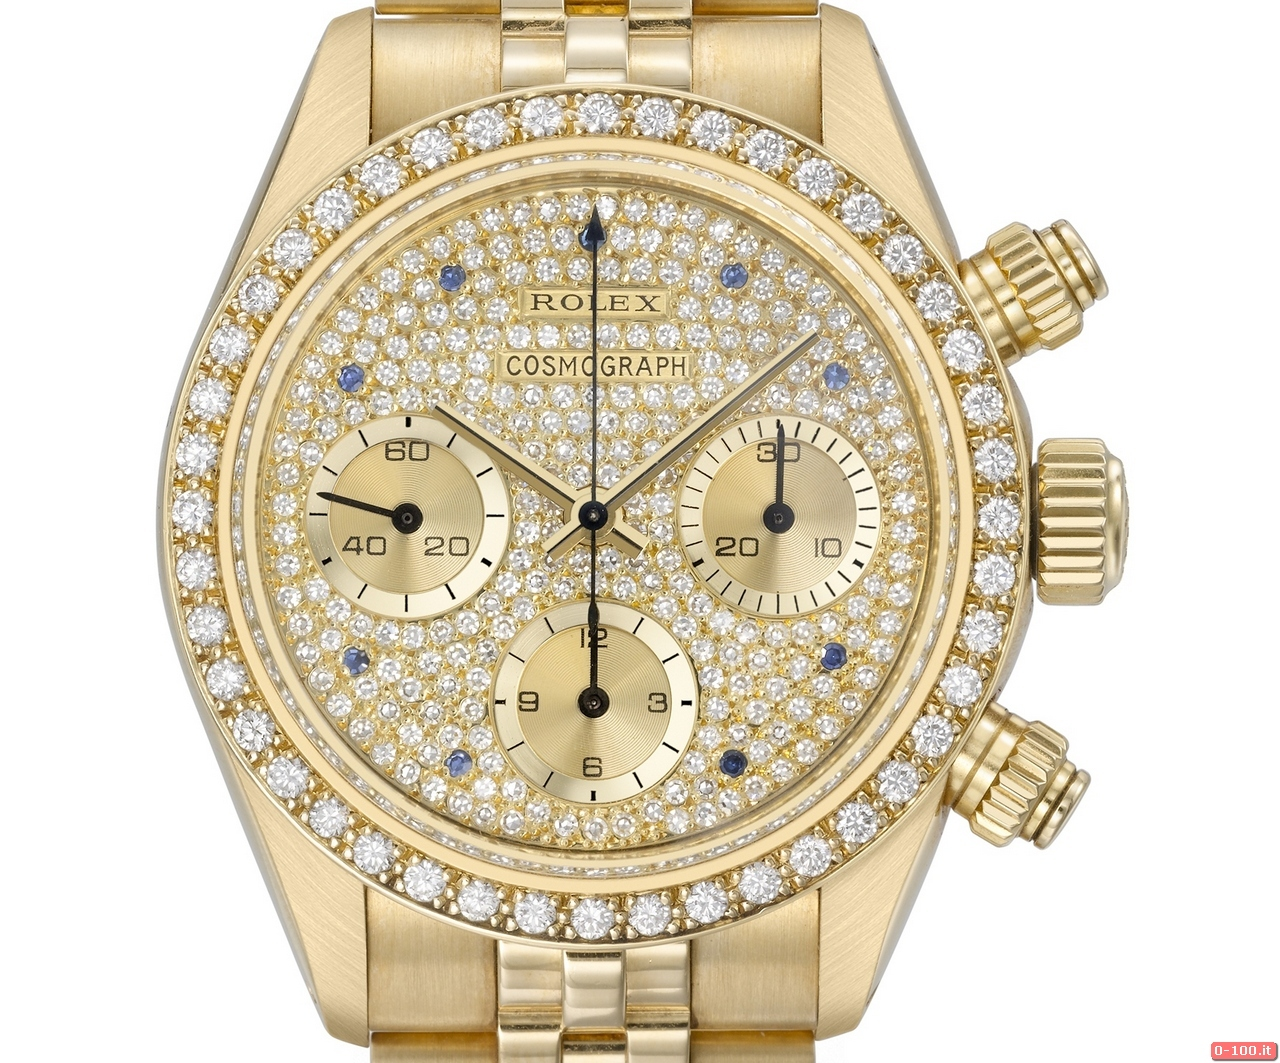 Rolex Jack of Diamonds, Ref. 6269_Christies_0-10020-100